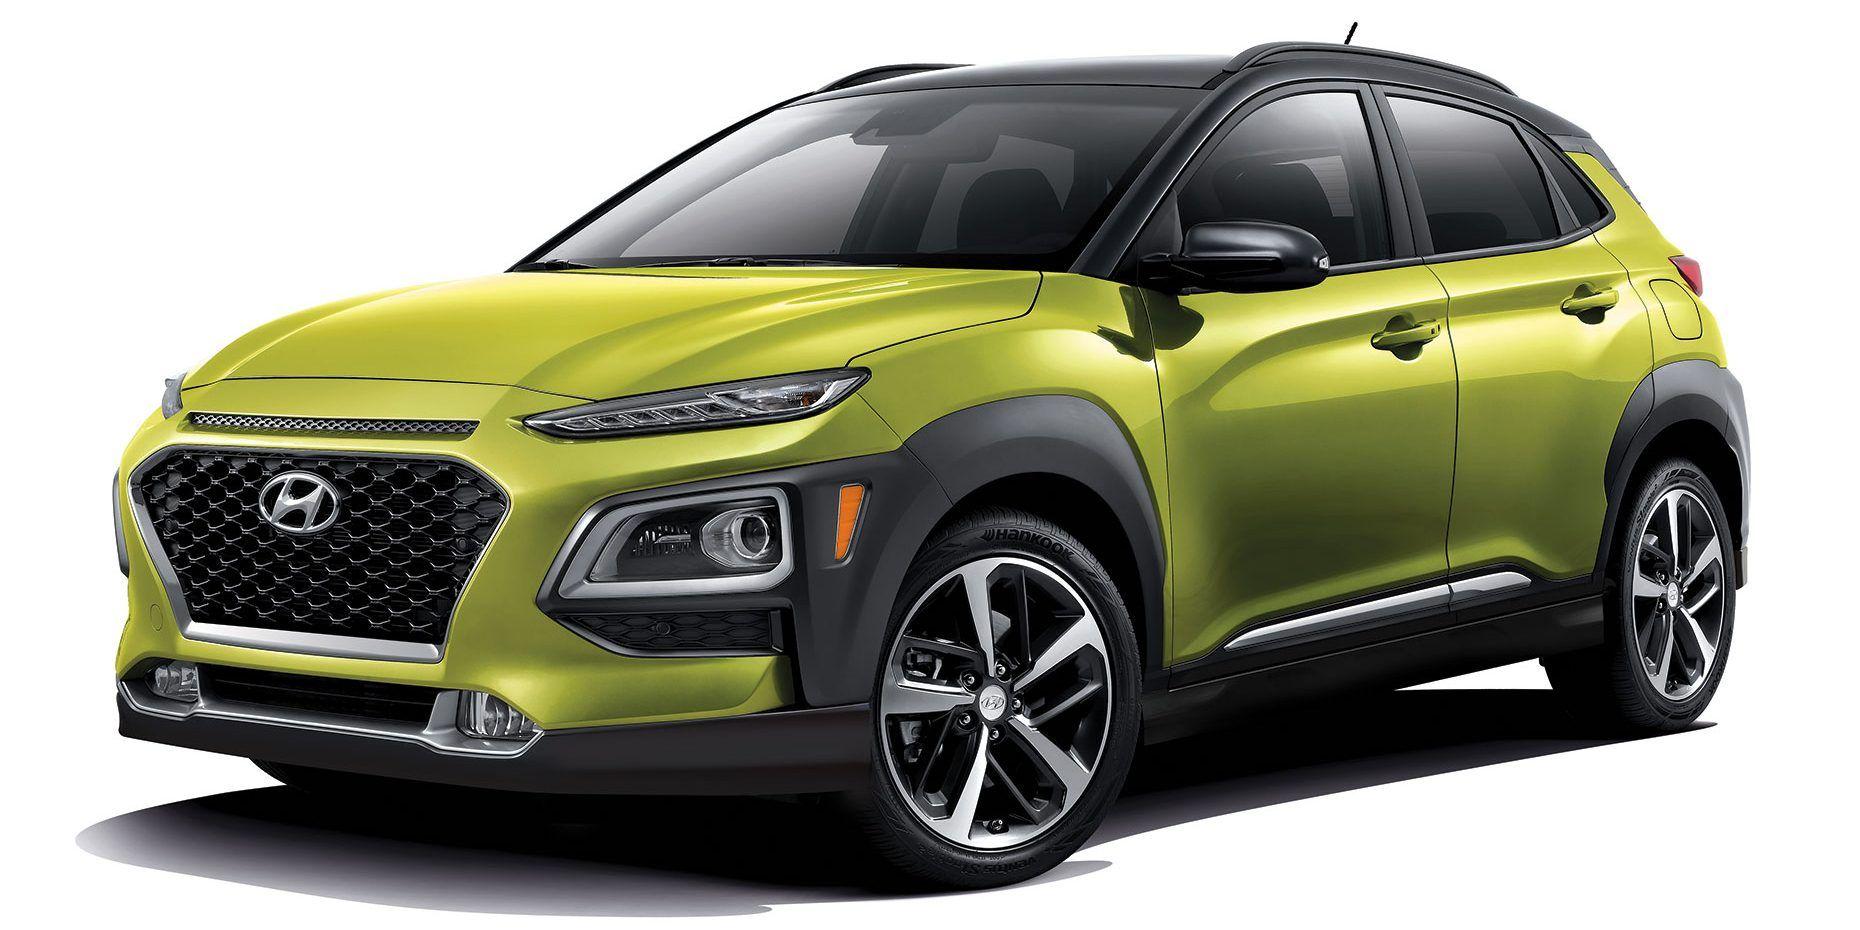 Hyundai_Kona_Exterior_F1-1860x930